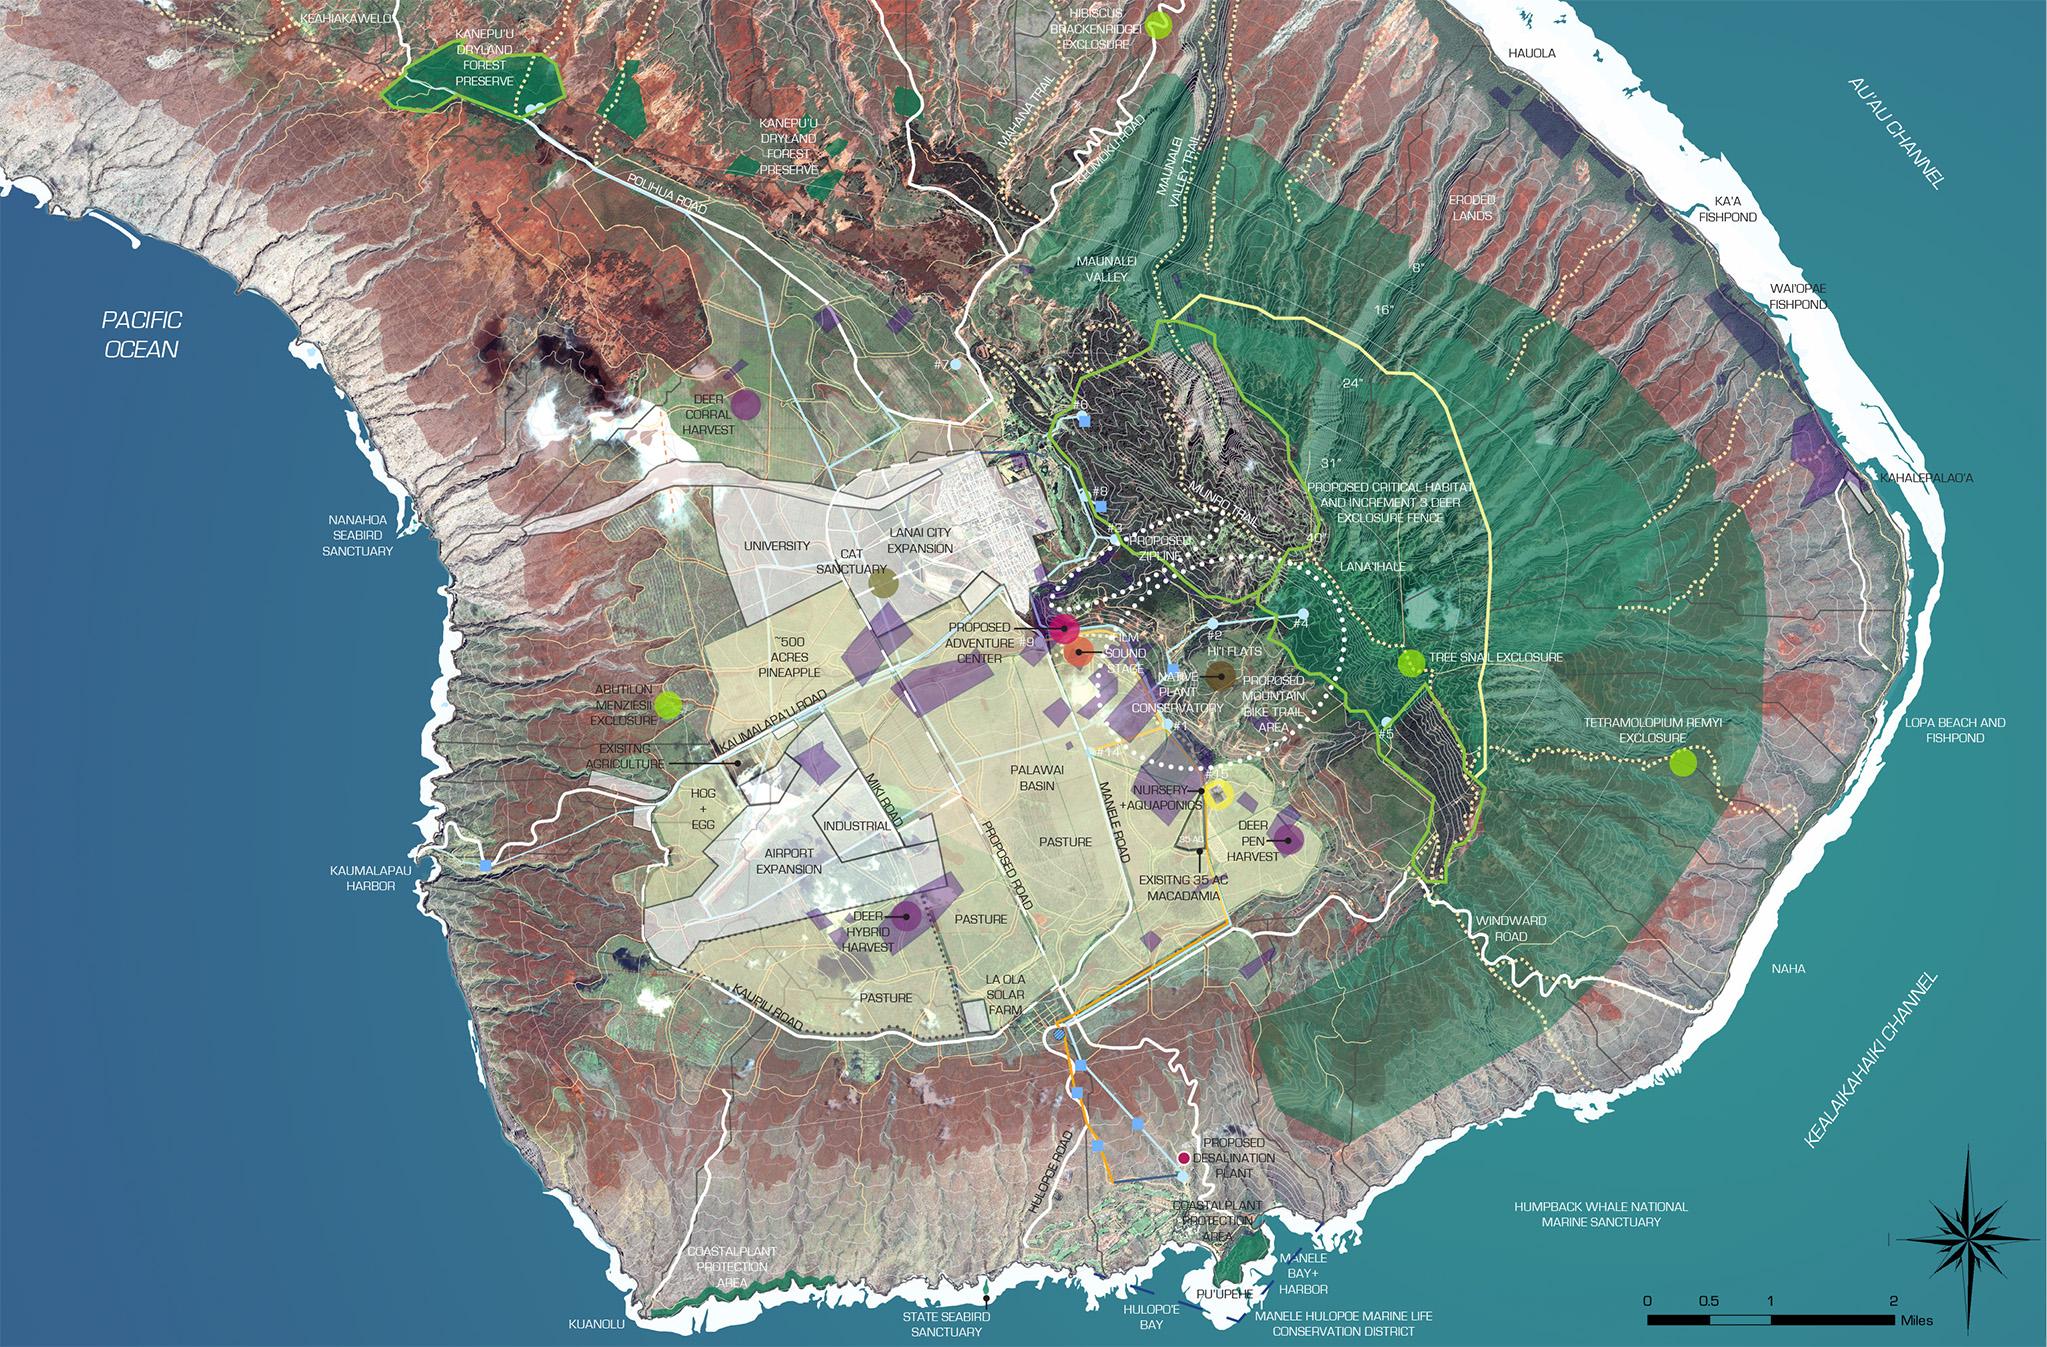 PALAWAI+MAP+8x10+10-31-13.jpg